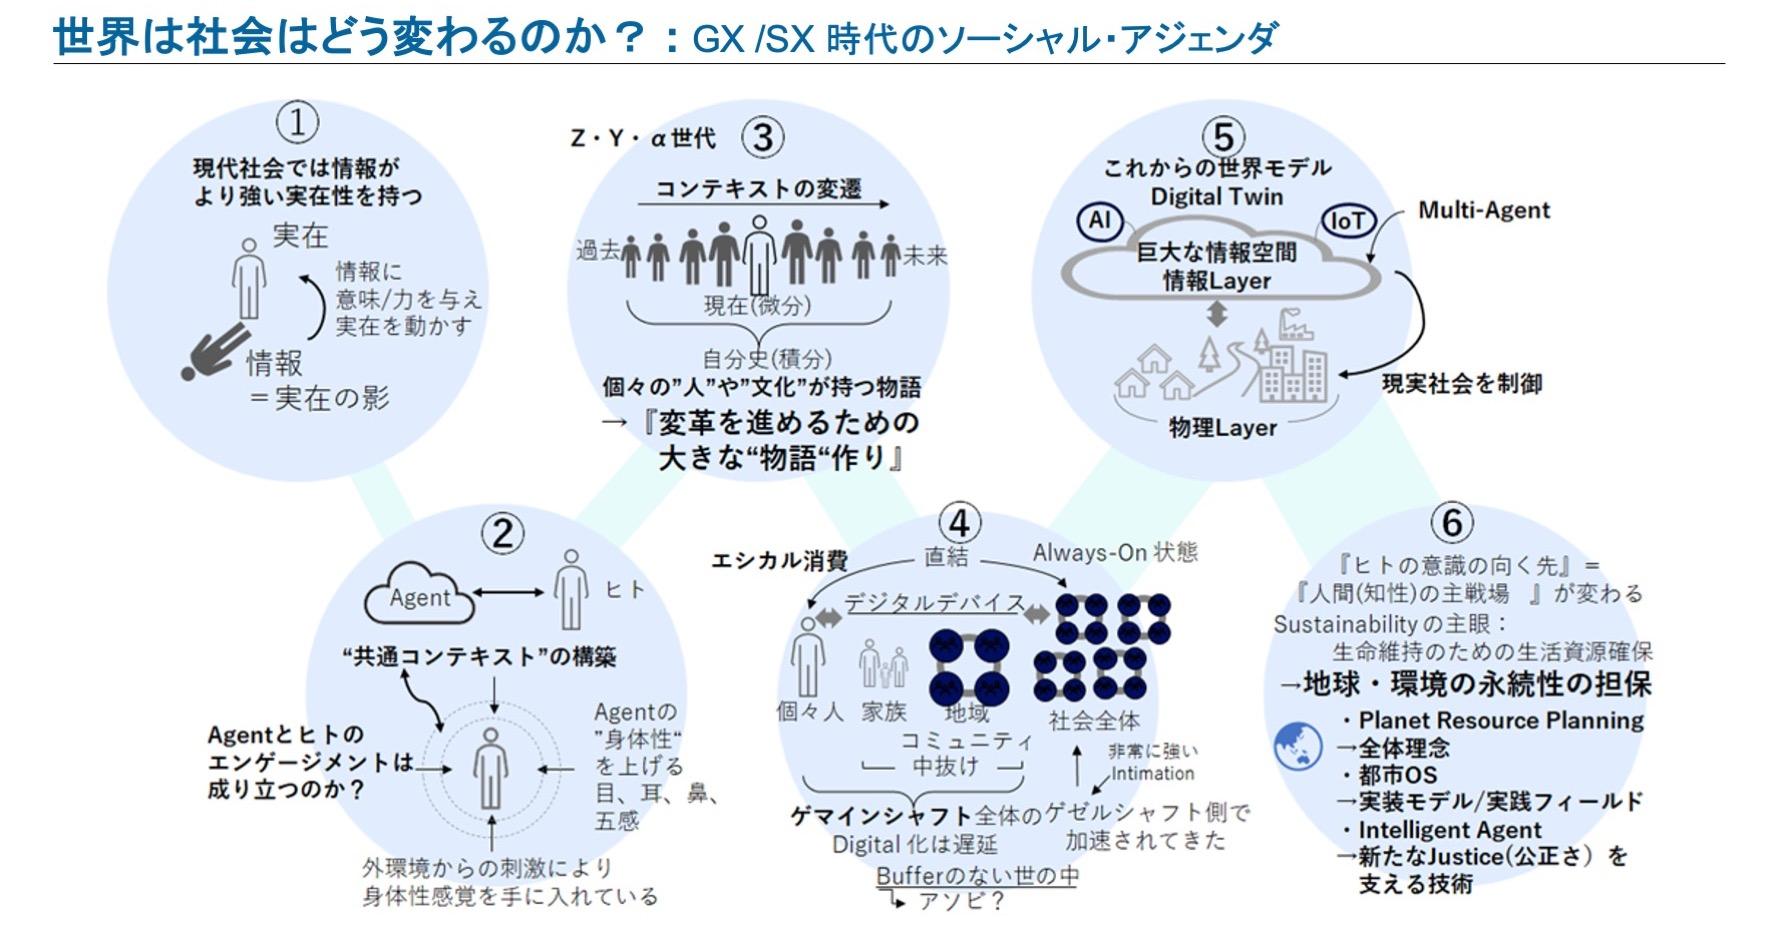 GX/SX 時代のソーシャル・アジェンダ